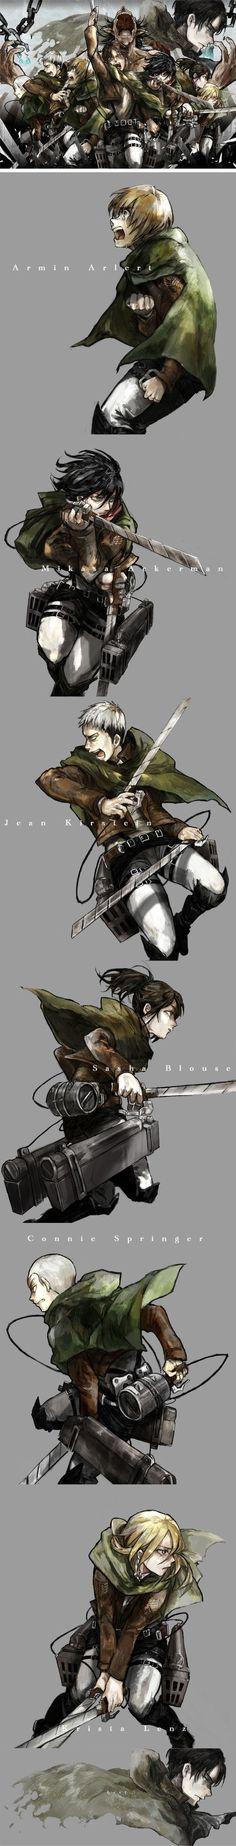 If eren isn't in the titan then WHO'S CONTROLLING THE TITAN